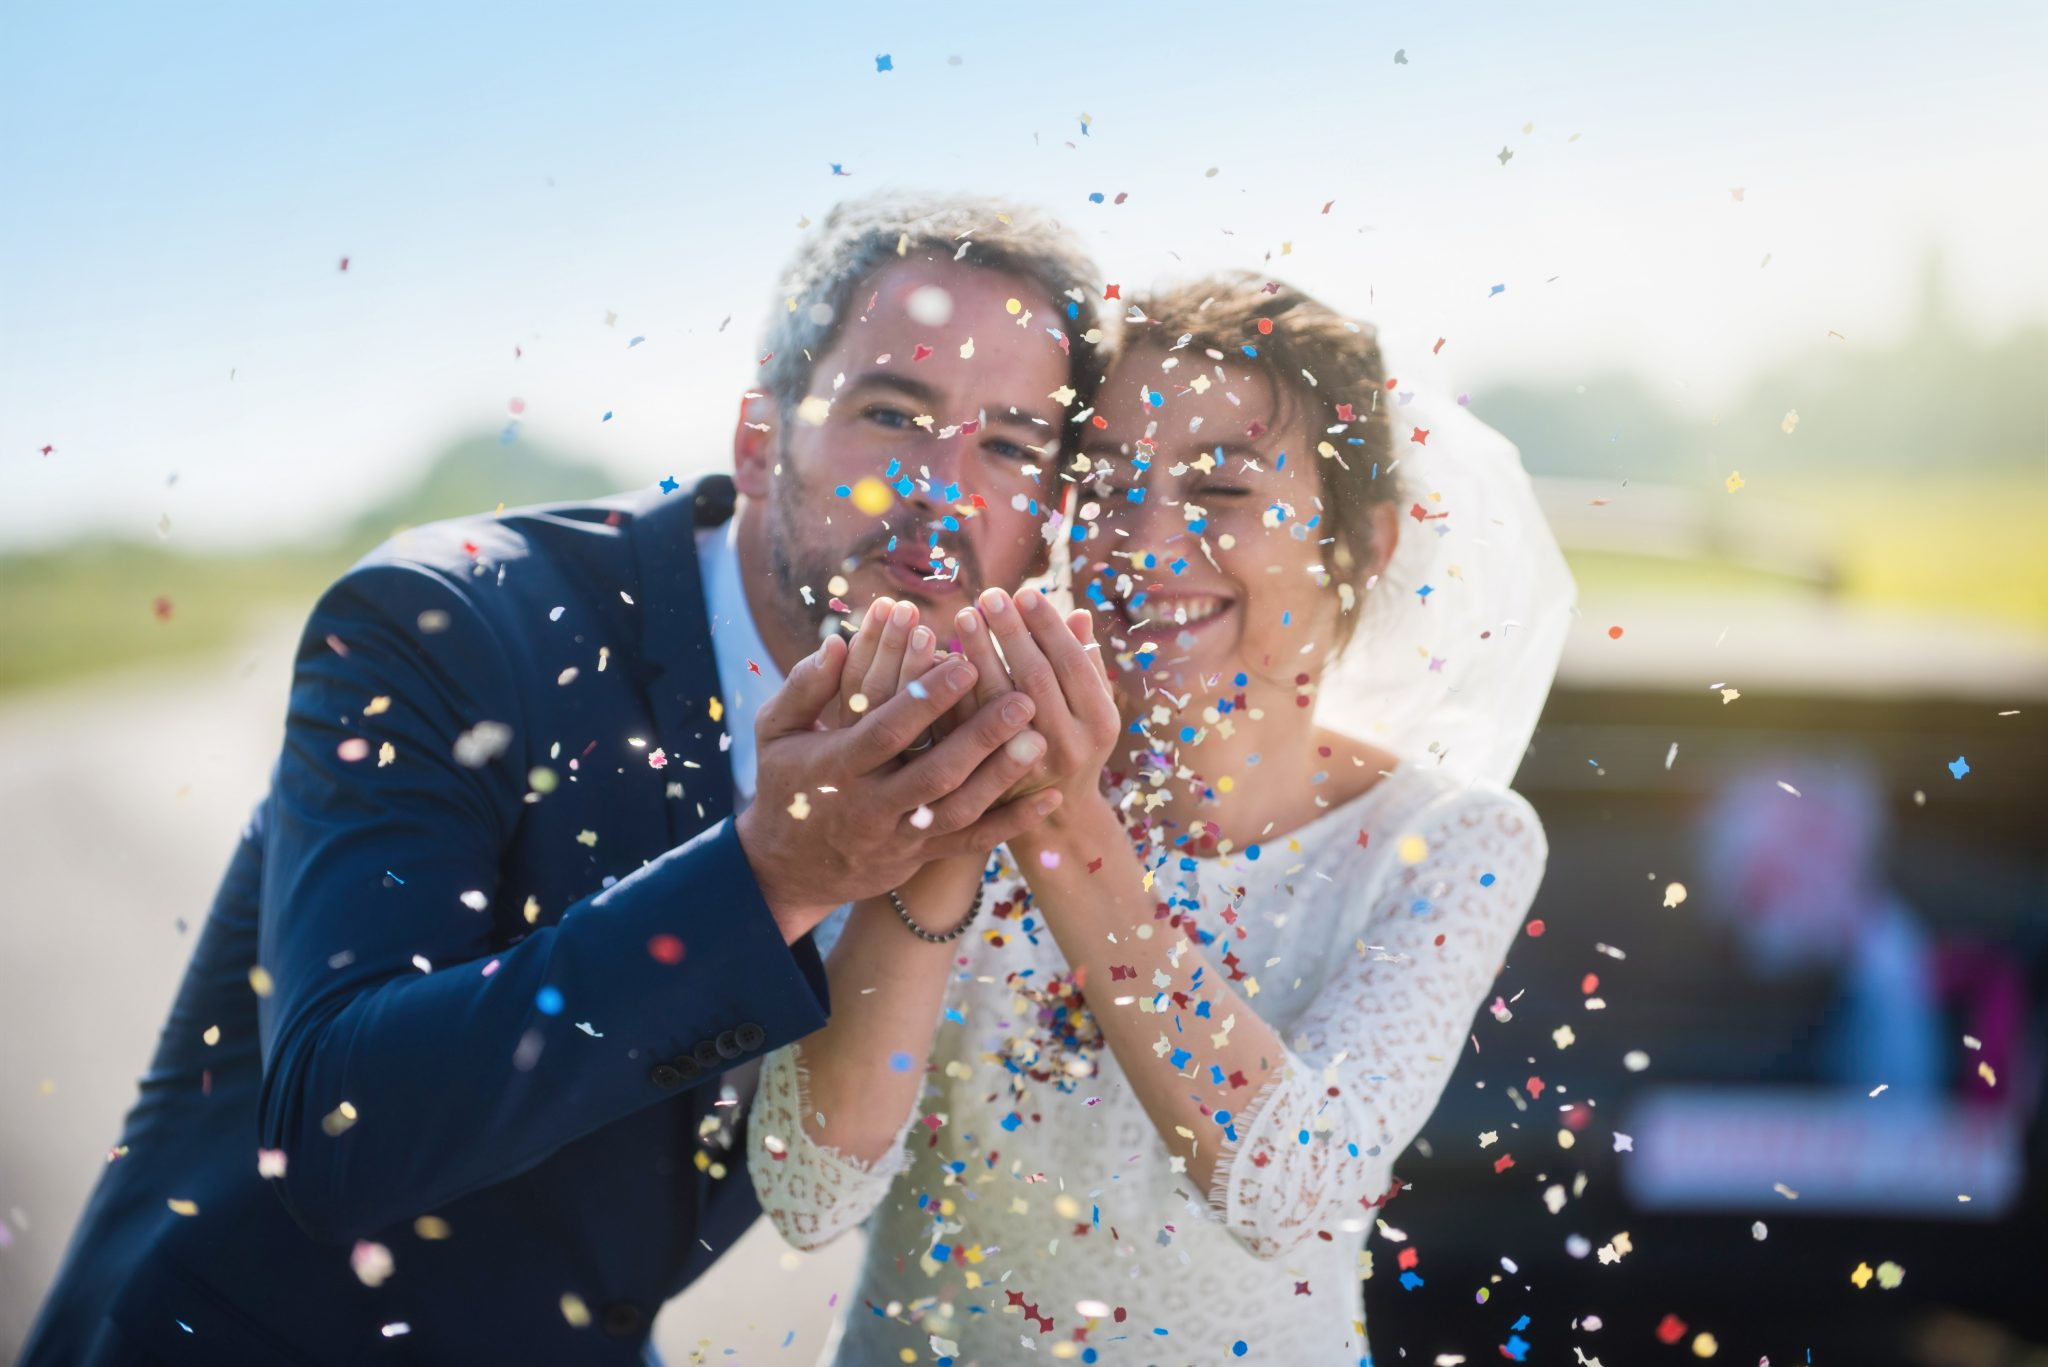 Corona-krisen verden over - Én person smittede 54 til bryllup